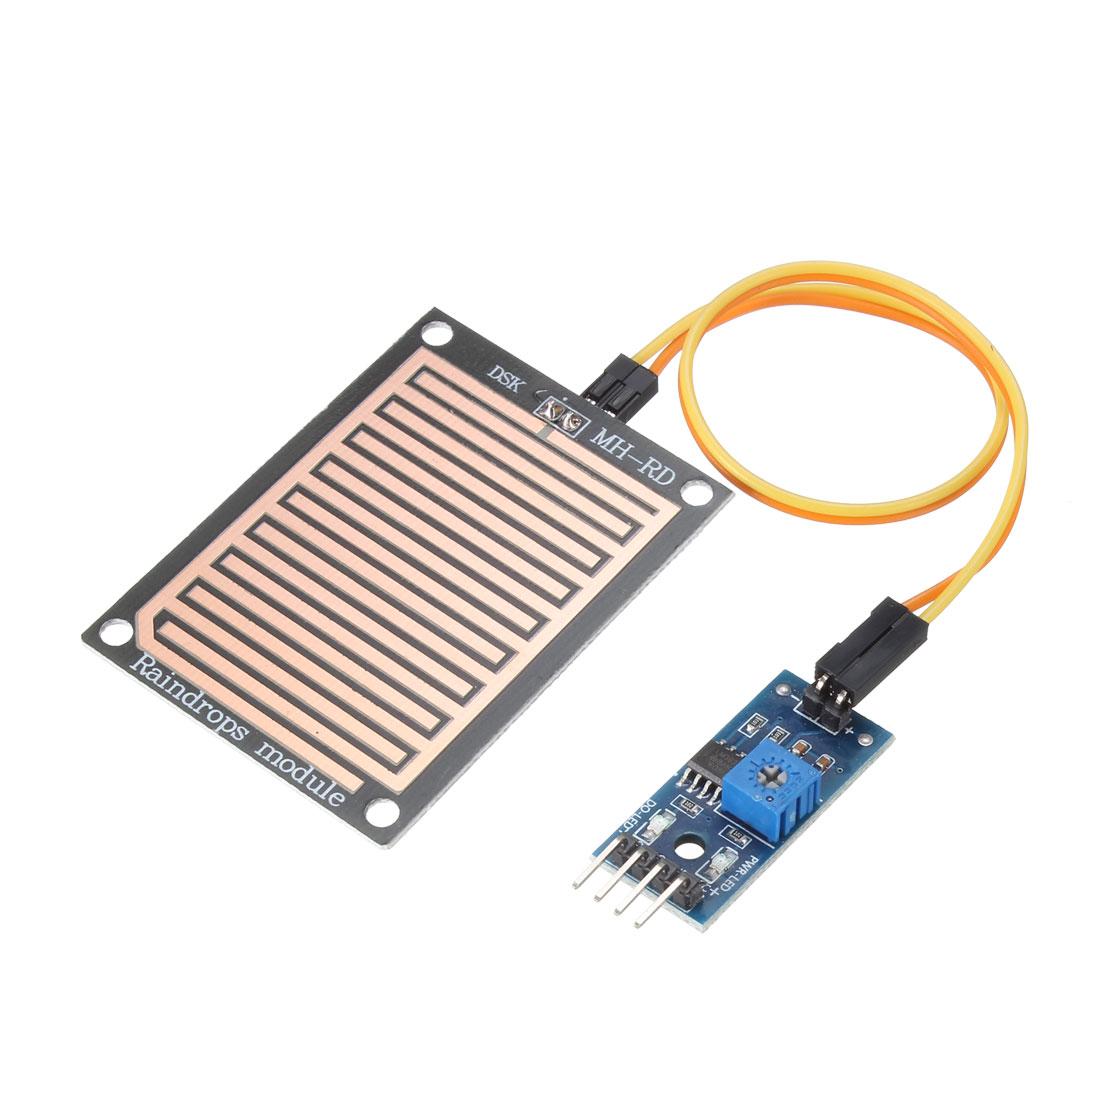 2 Pcs Rain Water Sensor Rainwater Module Rain Moisture Detection Module 3.3V-5V